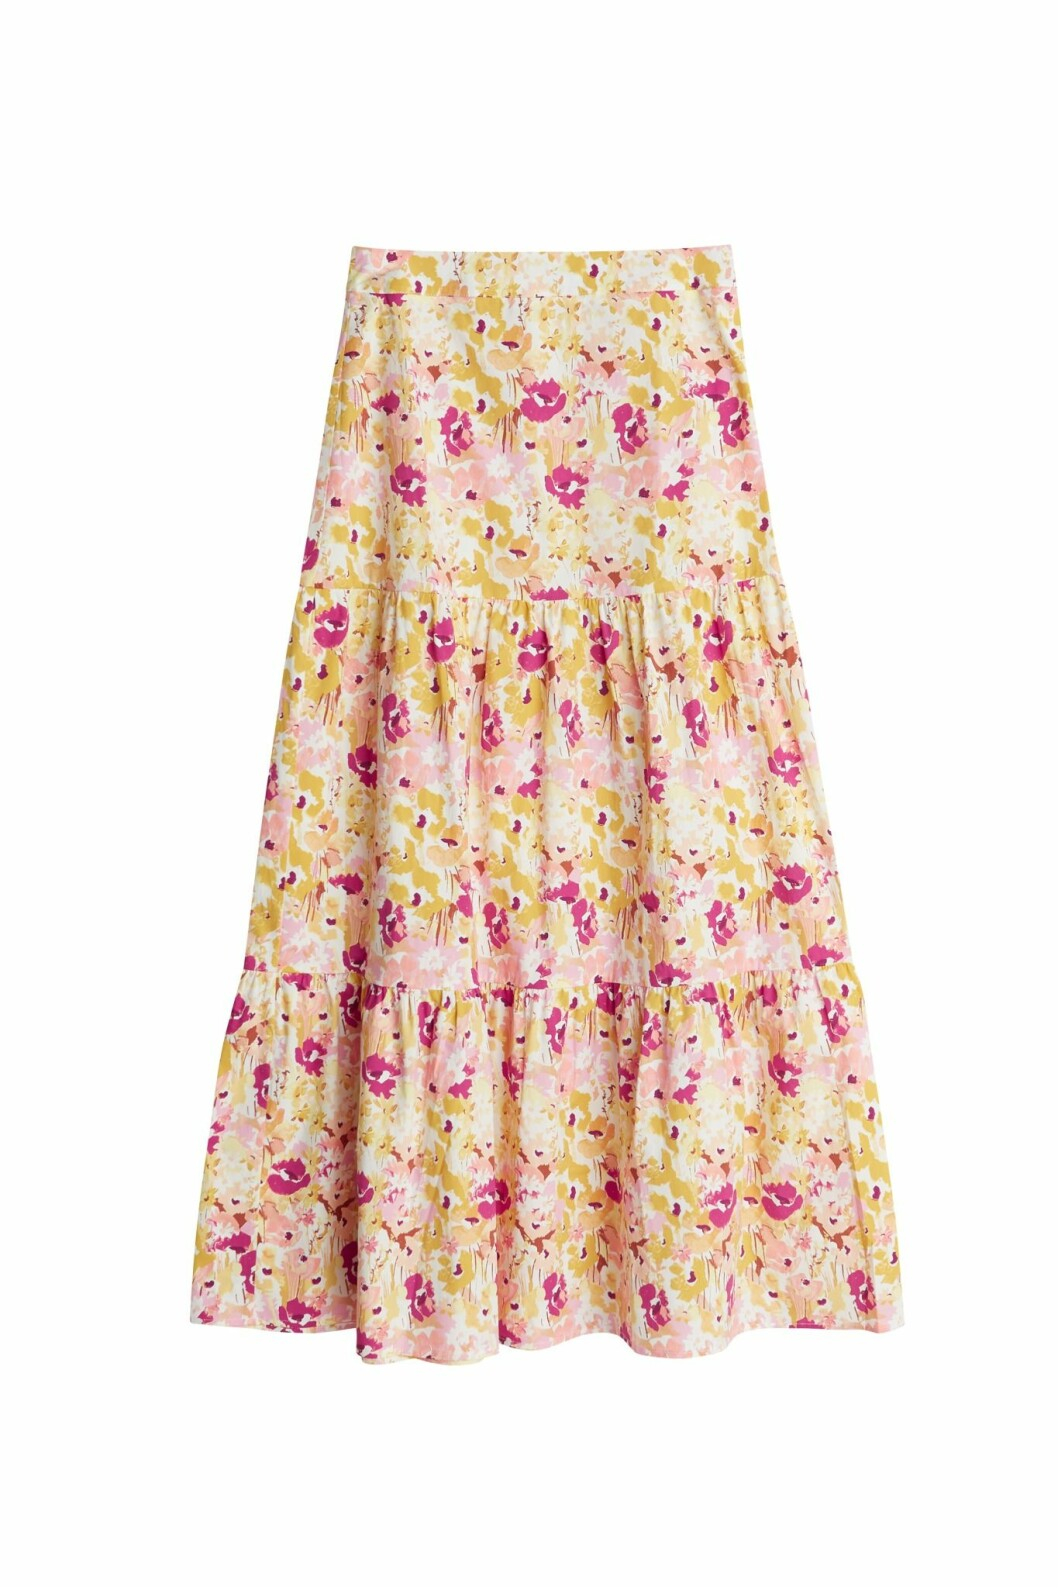 Maja Nilsson Lindelöf gör kollektion med Gina tricot –blommig kjol